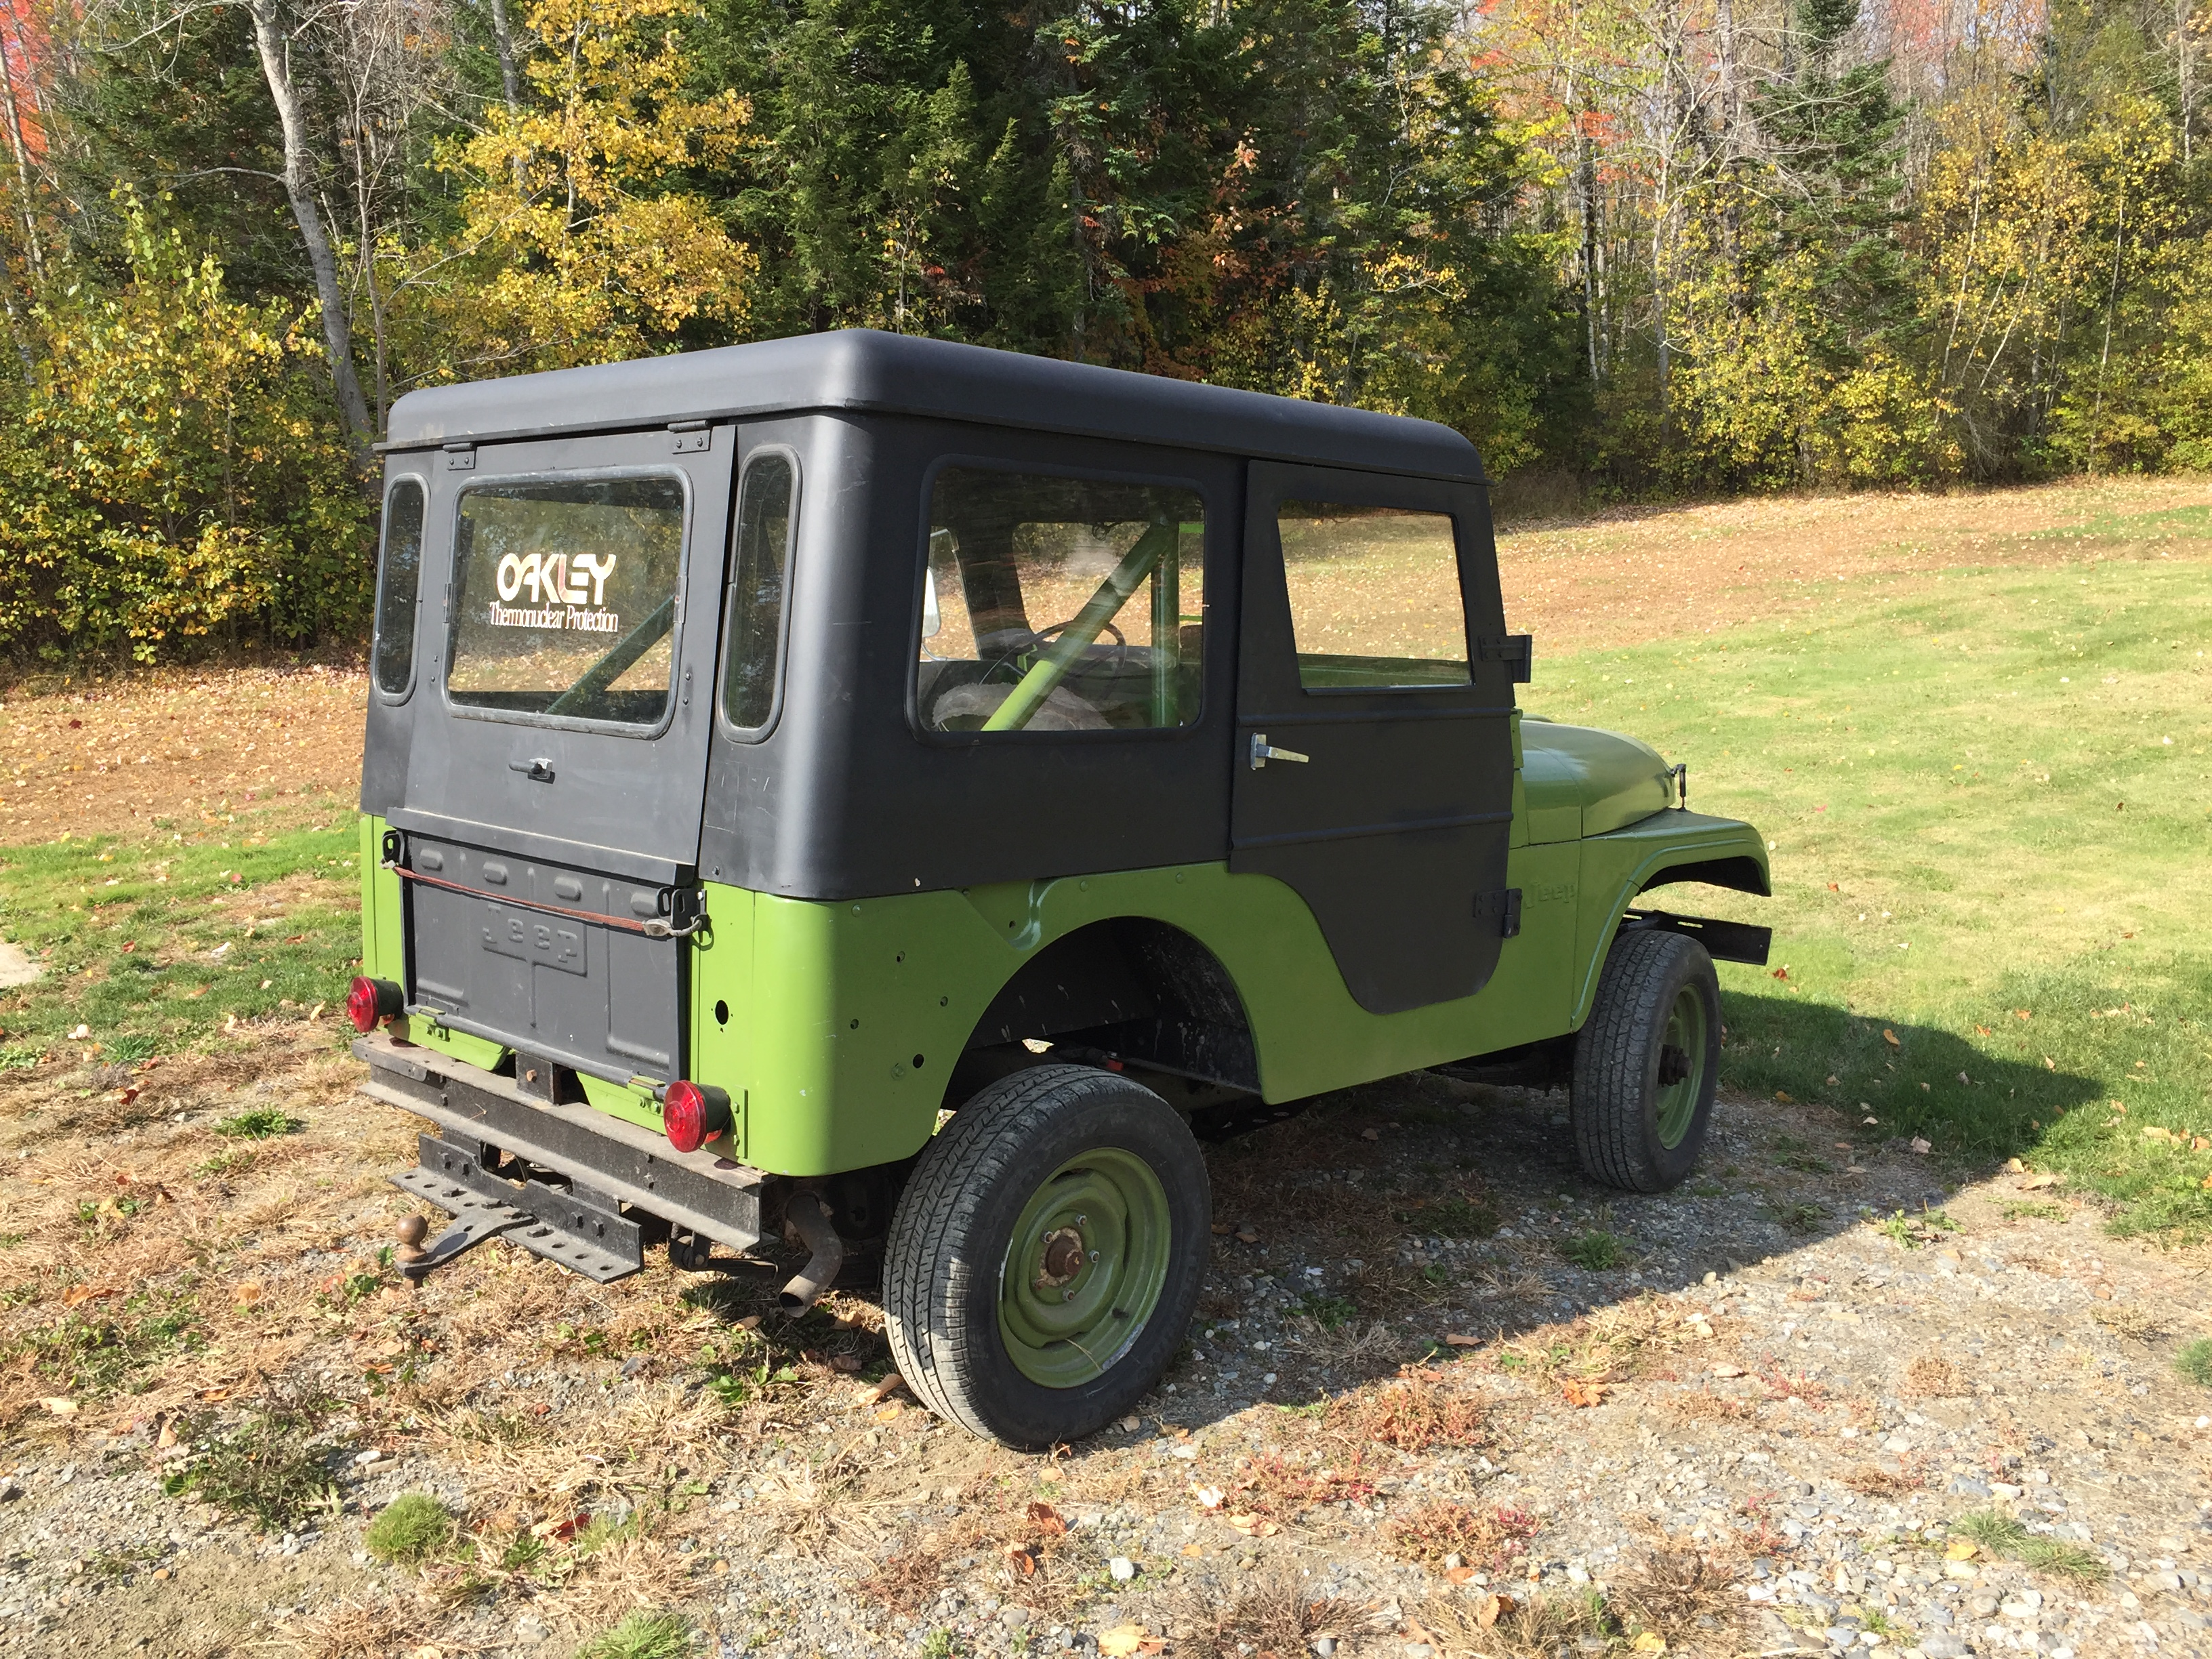 1966 Jeep Cj 5 Upgrades And Future Rebuild Vintage Vehicles Centech Wiring Harness Cj7 2016 10 16 115131